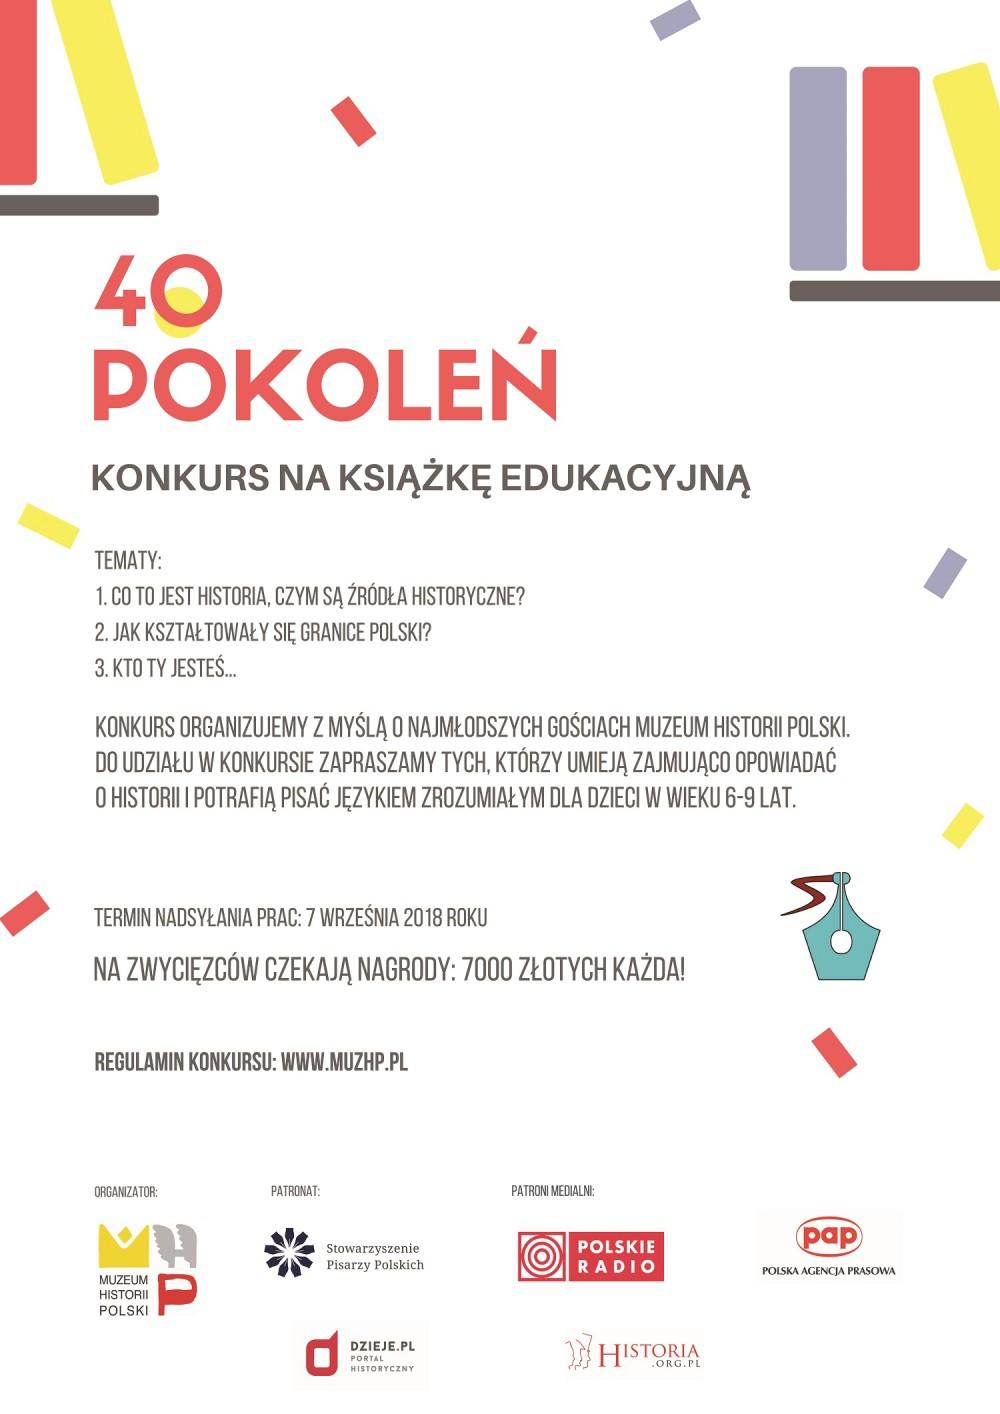 KONKURS MUZEUM HISTORII POLSKI